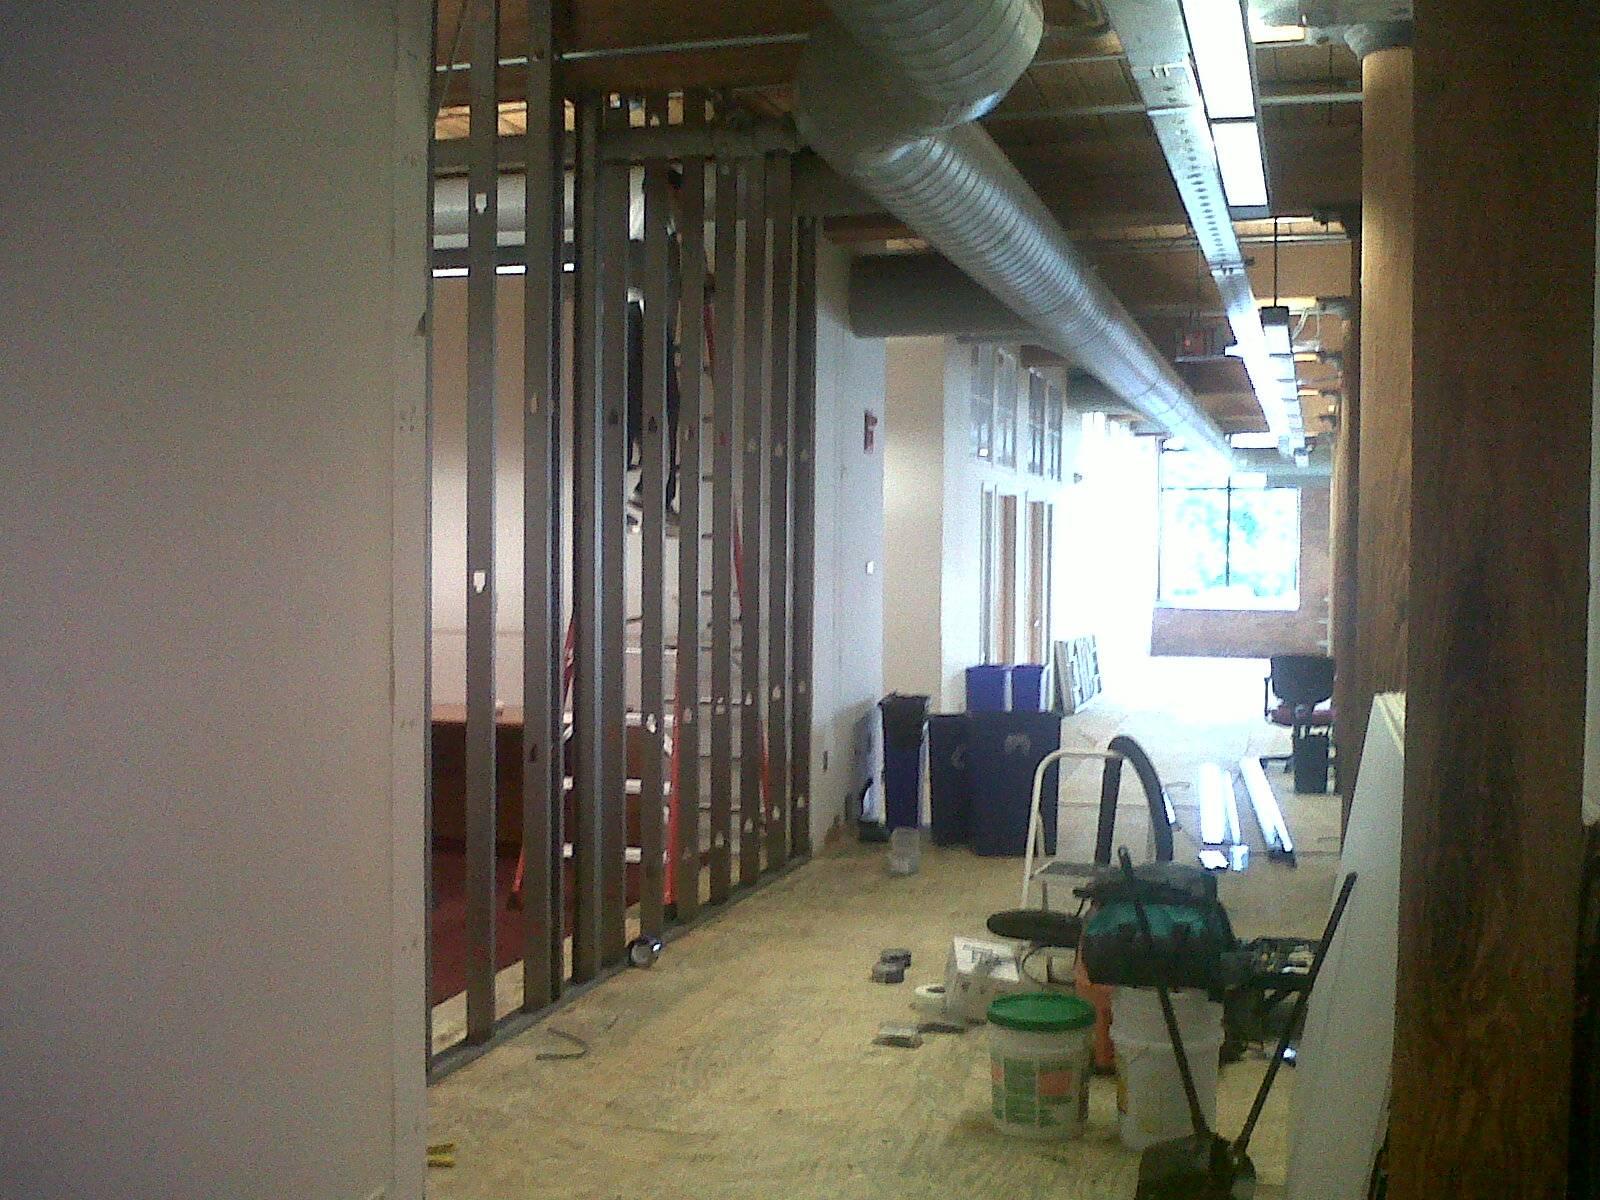 Progress Image 1: Metal Framing Going Up For New Storage Room